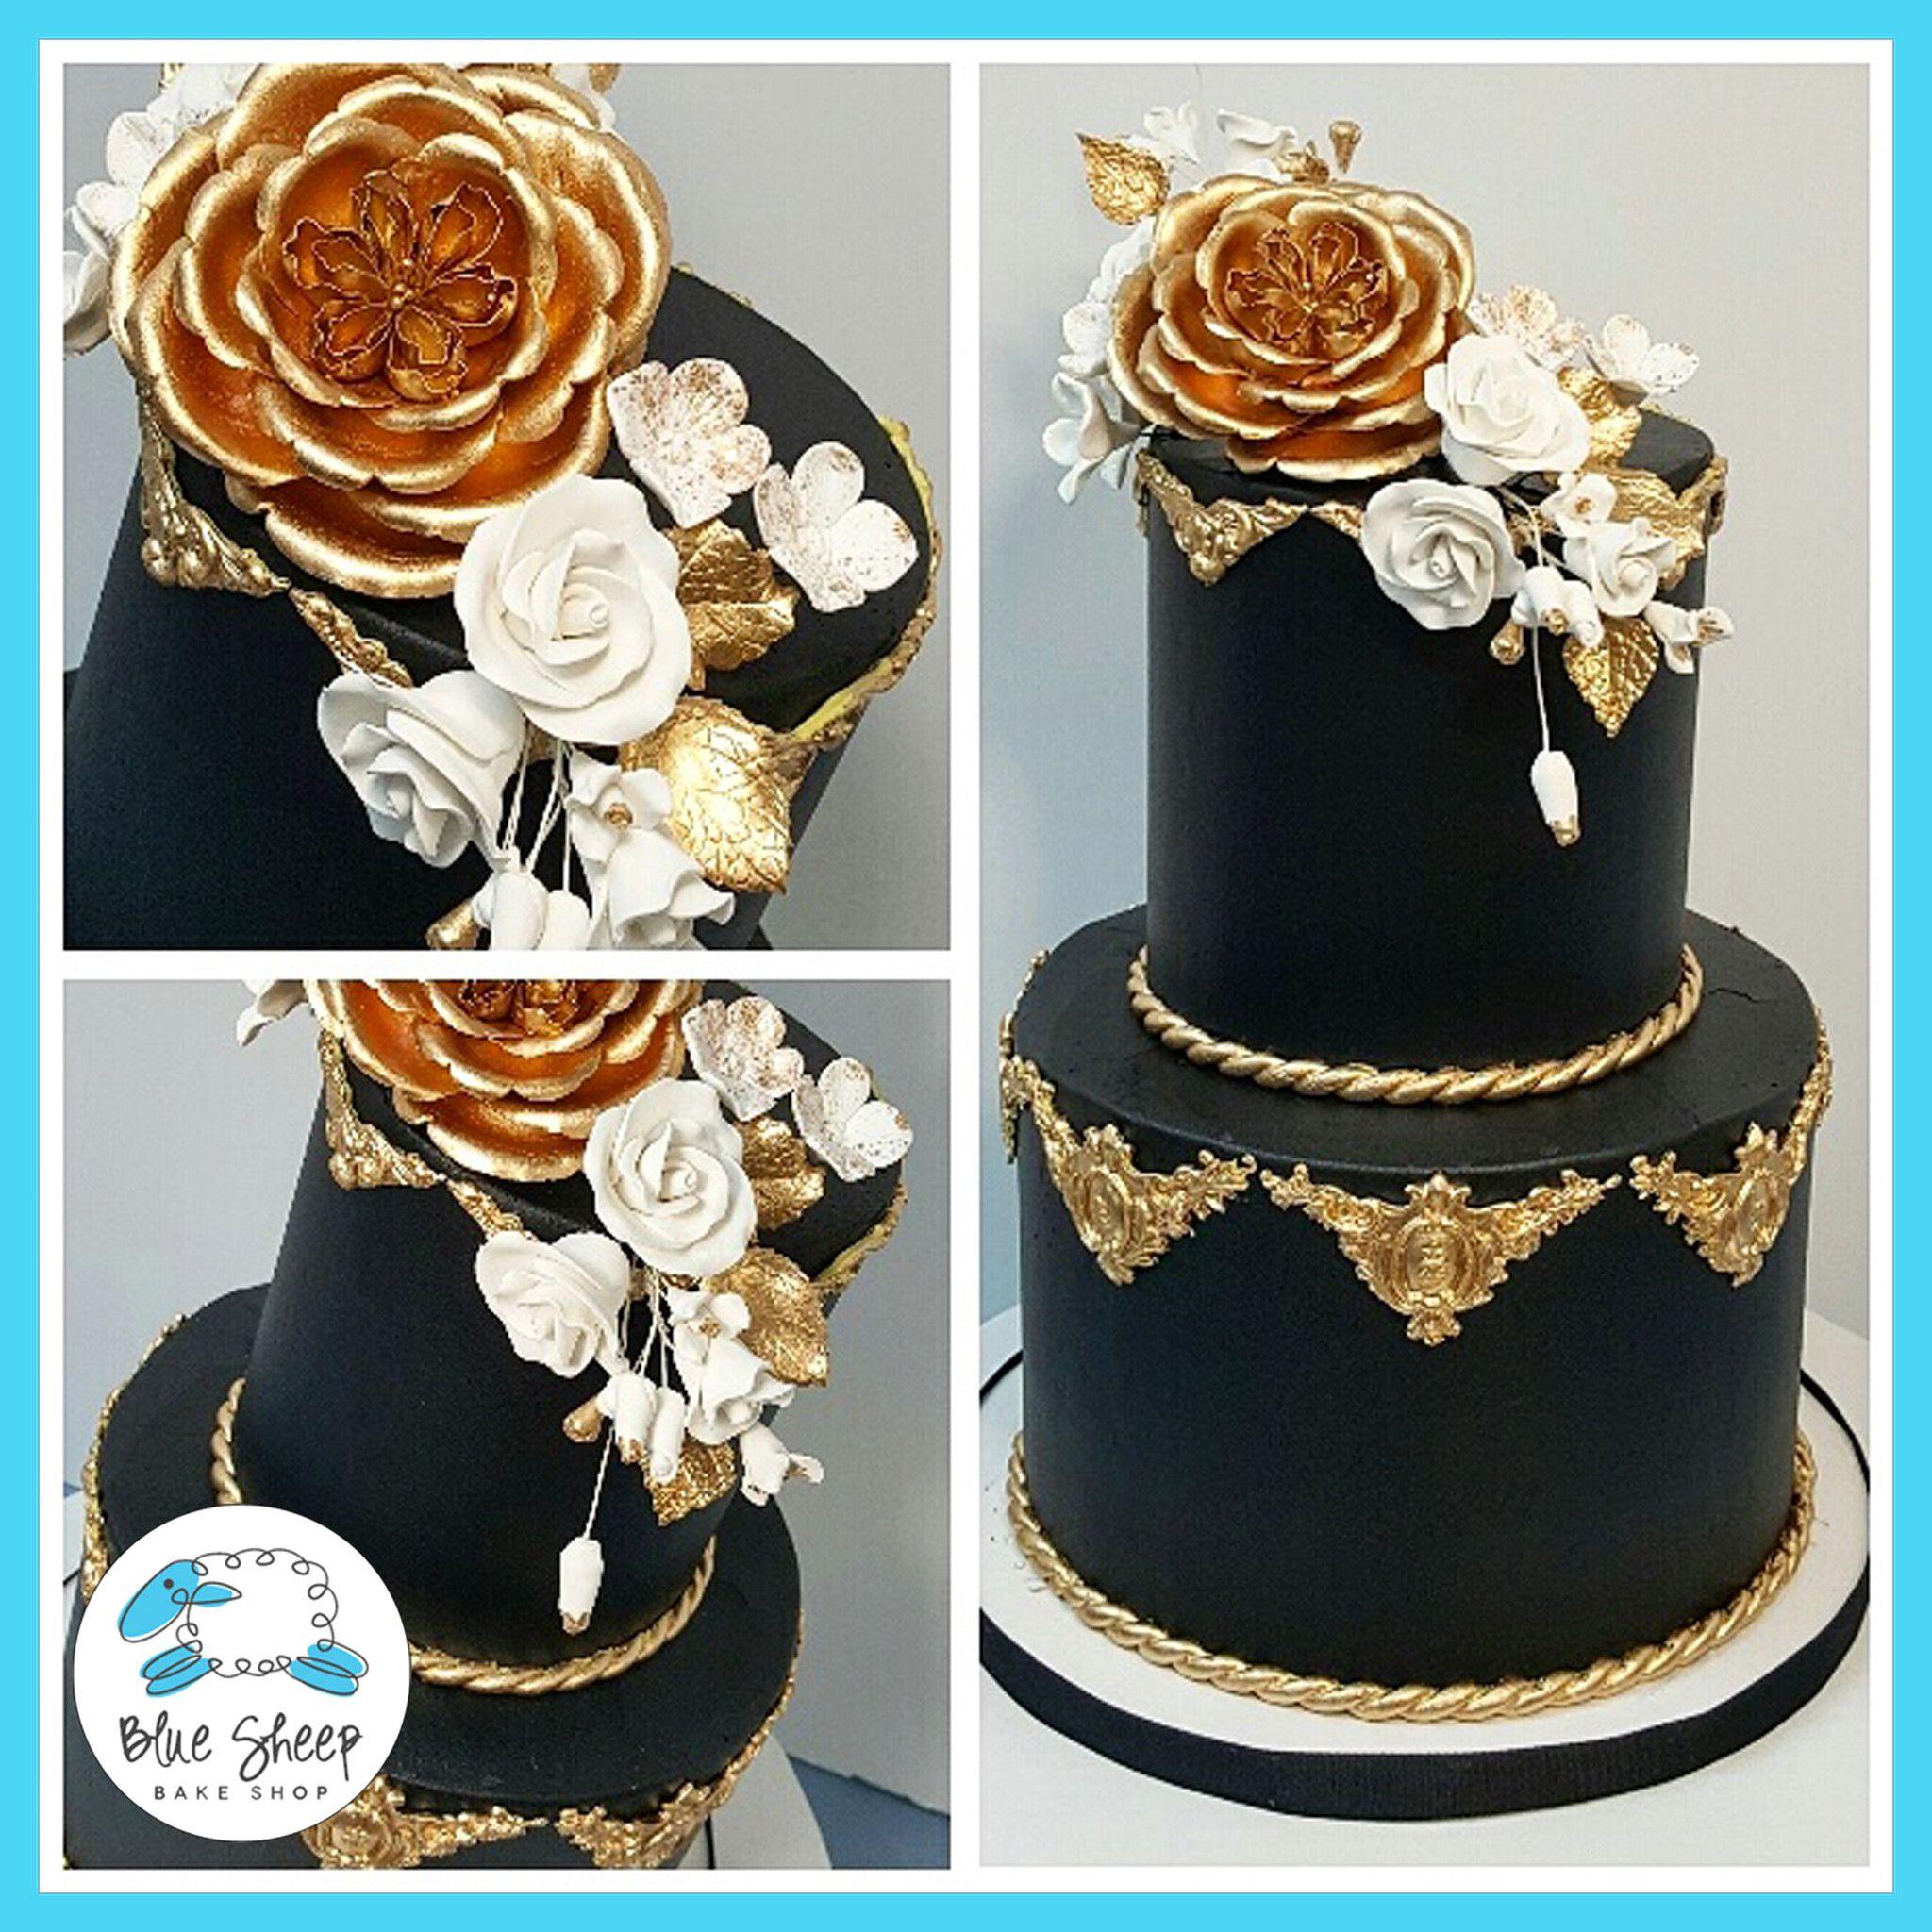 Black And Gold Buttercream Wedding Cake Nj Blue Sheep Bake